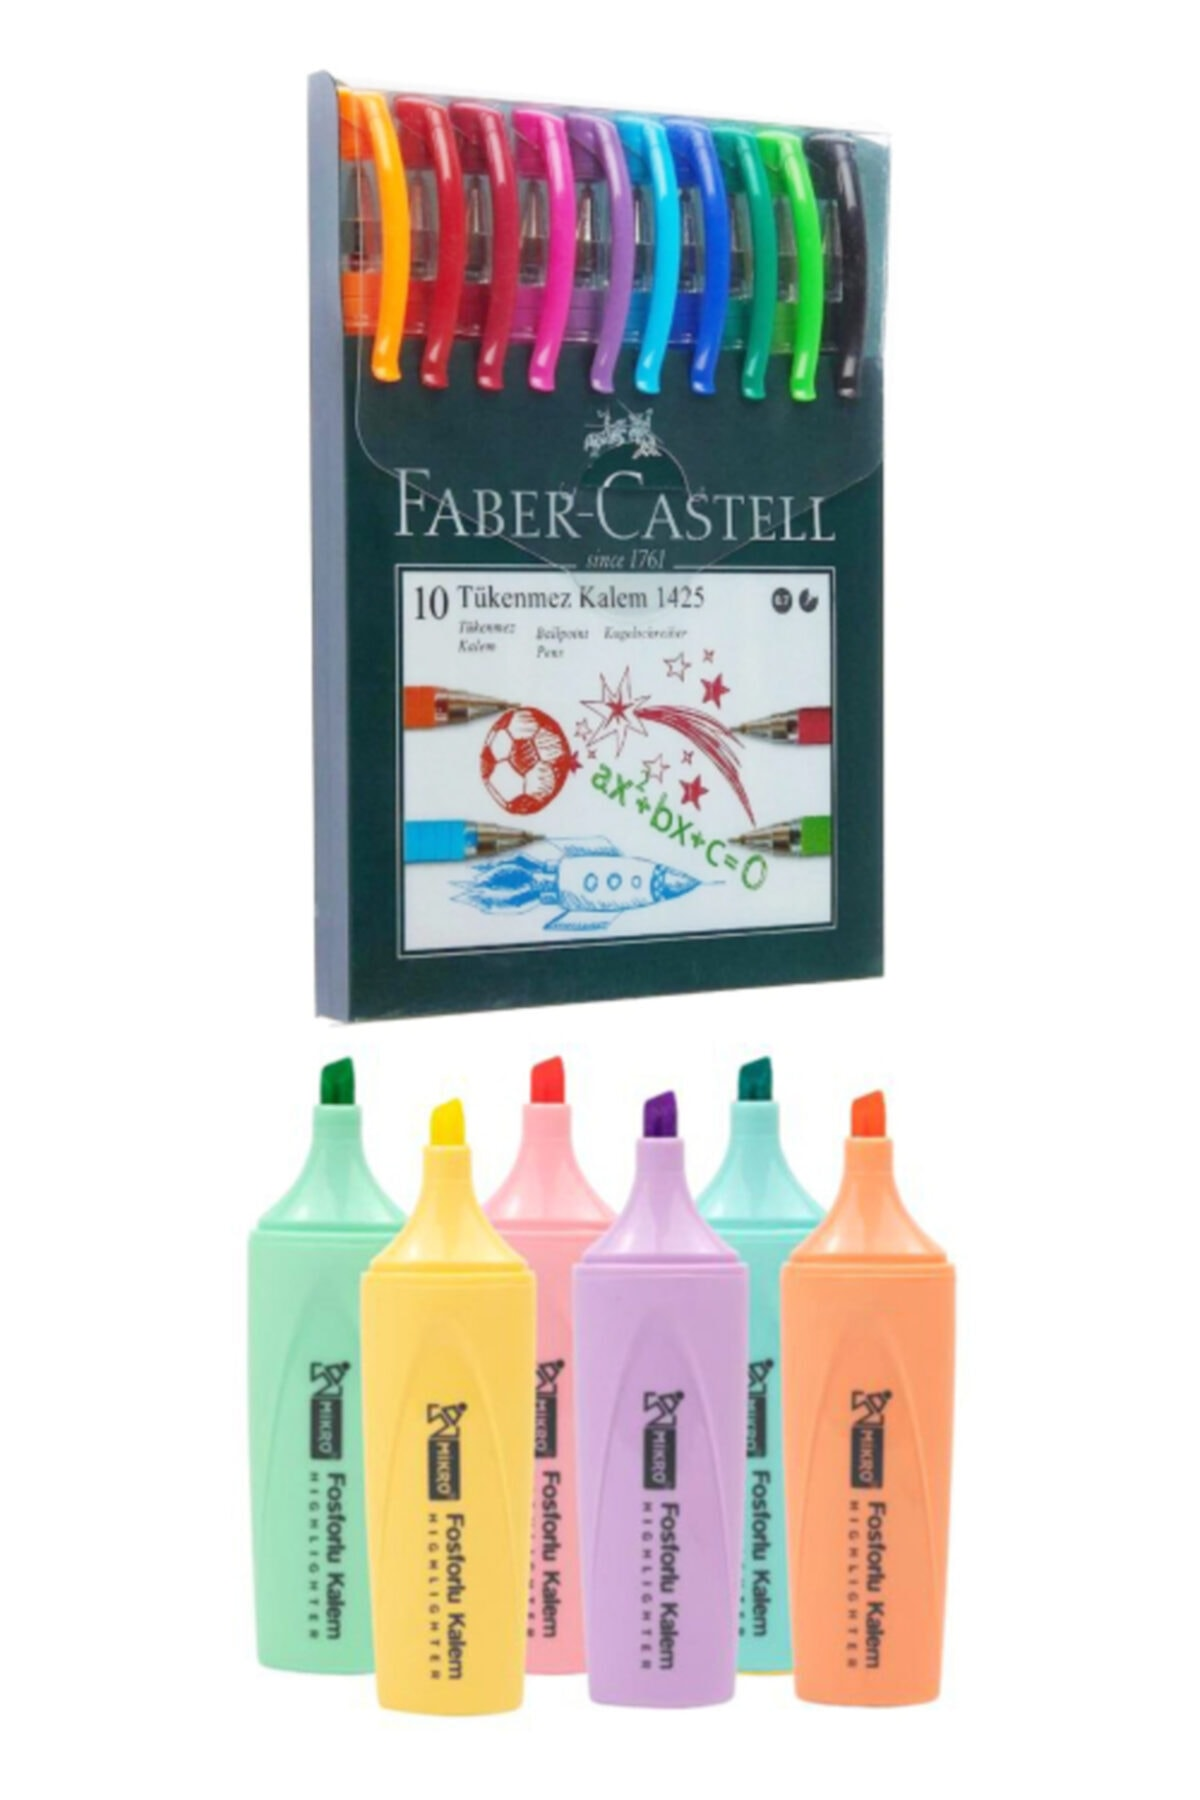 Faber Castell 10 Renk Tükenmez Kalem 1425 + Mikro 6 Renk Pastel Fosforlu Mk-605 1